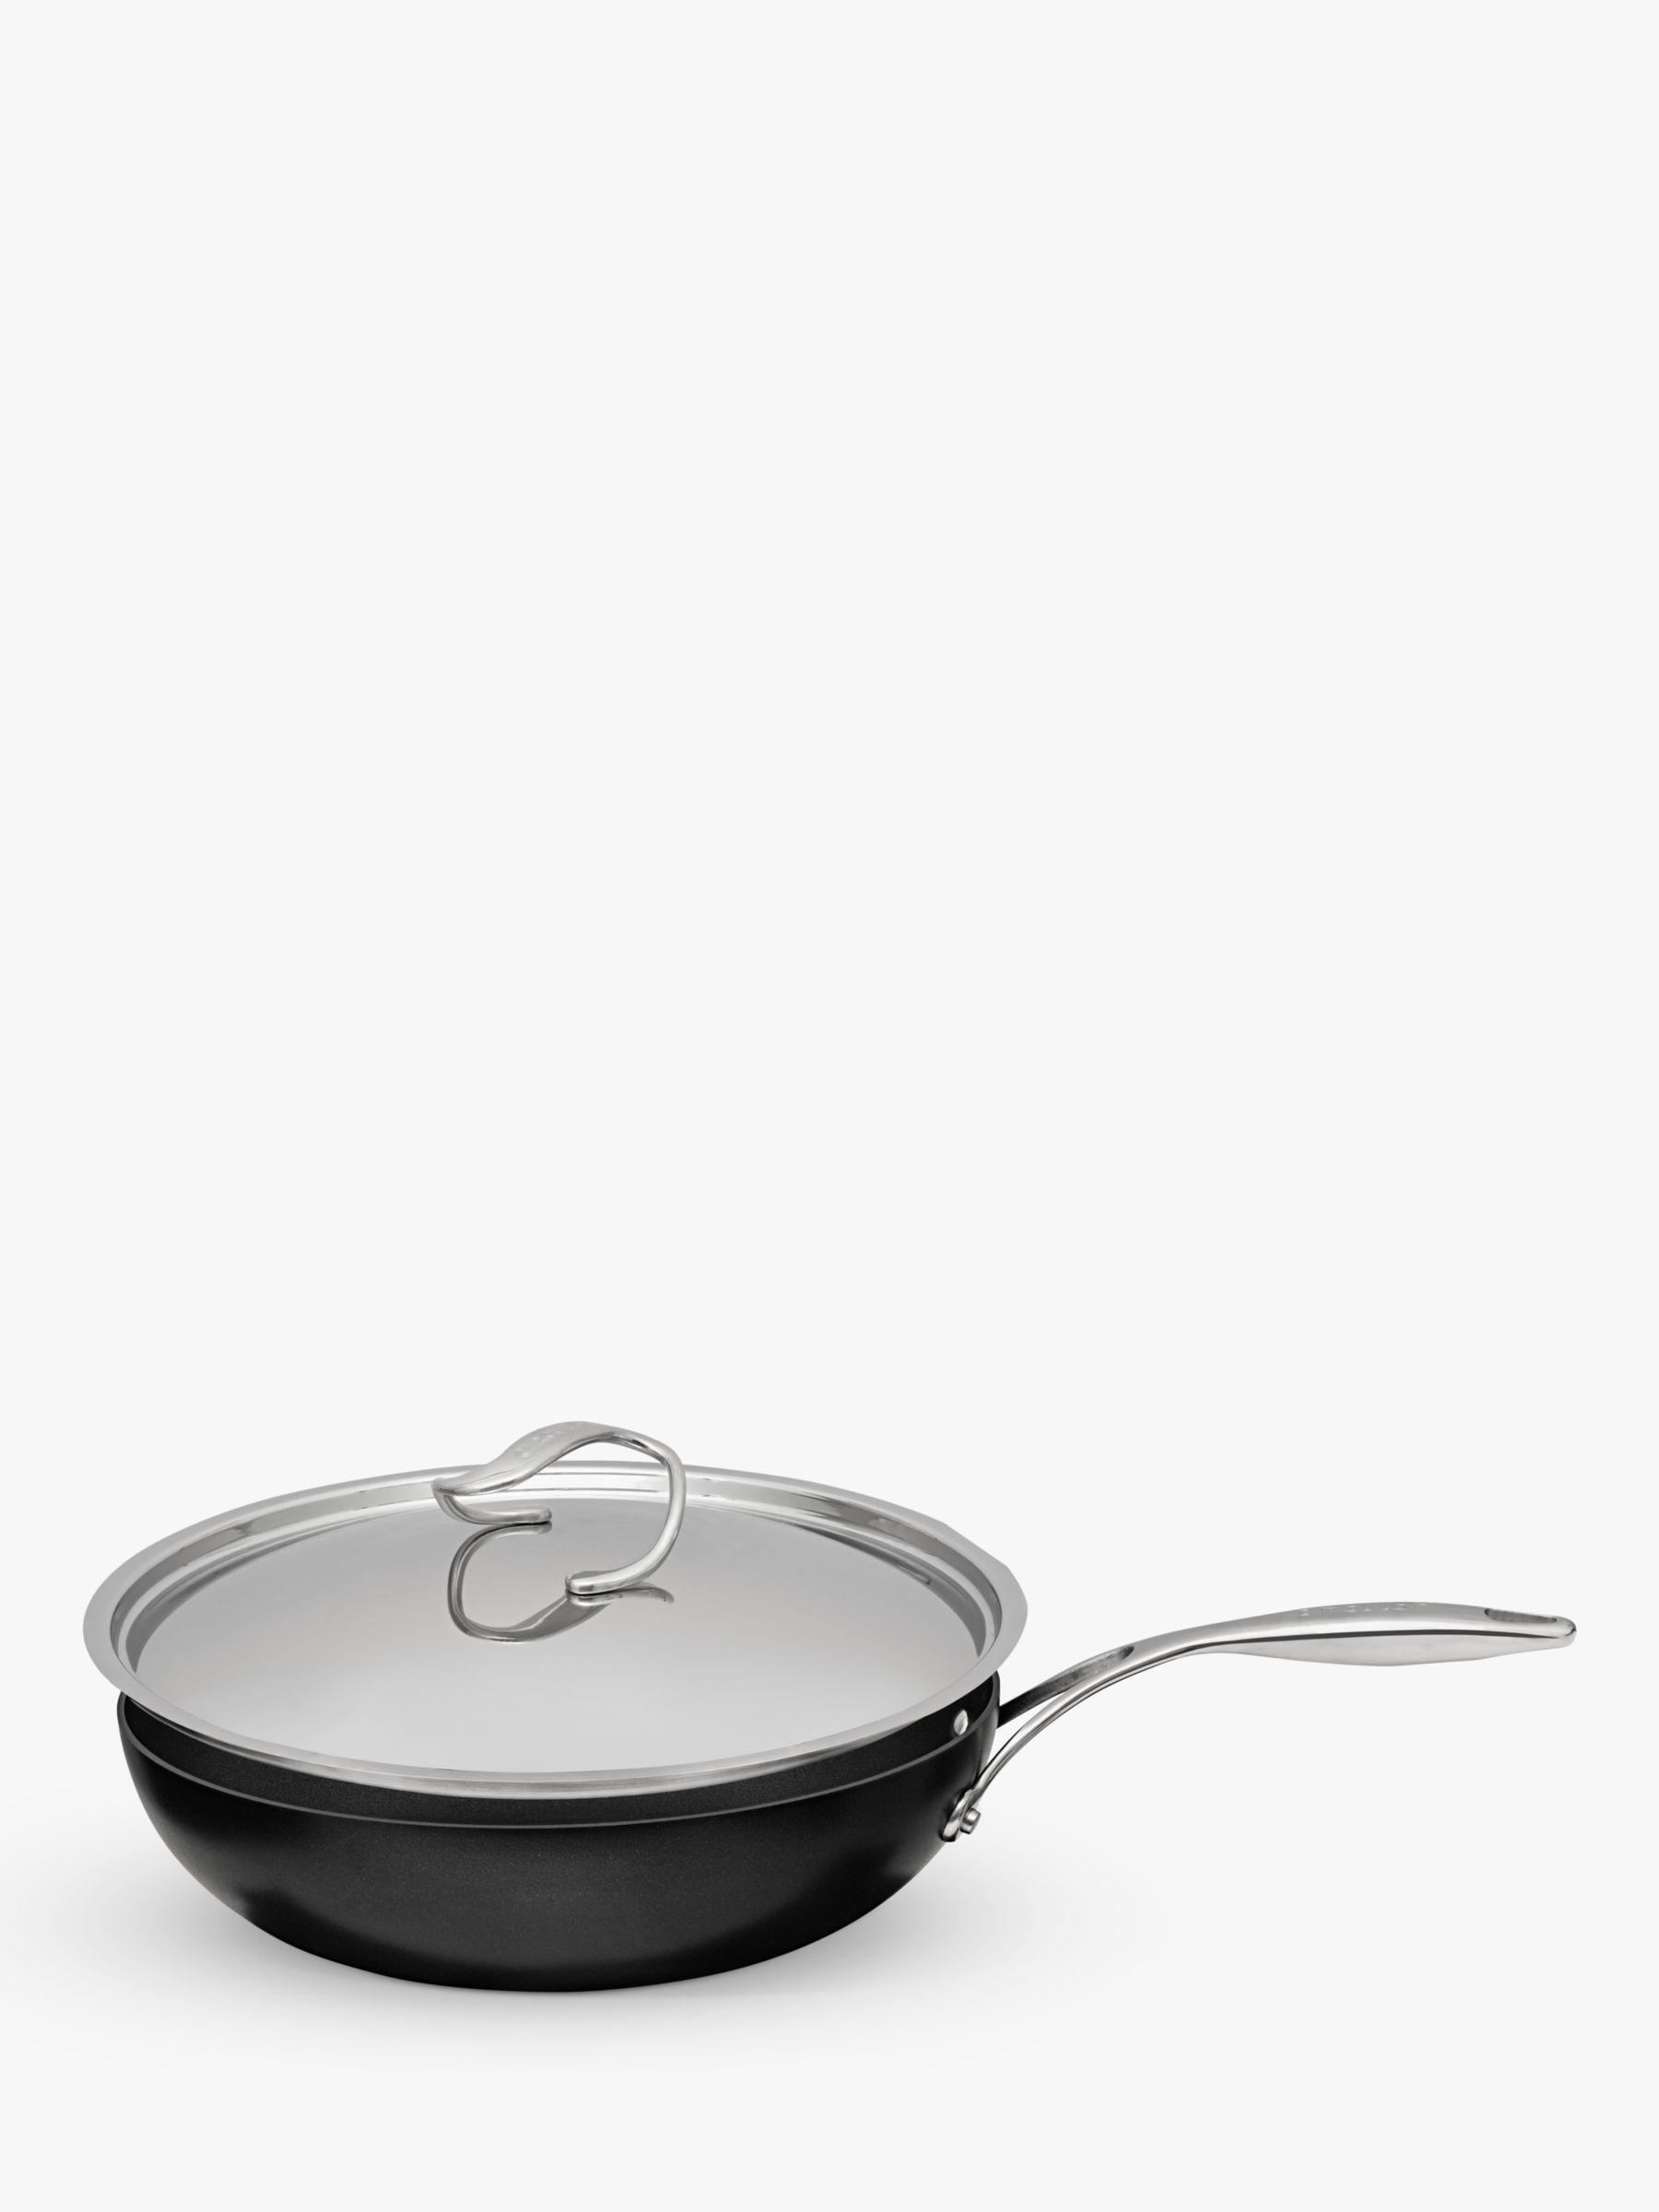 Circulon Circulon Style Hard-Anodised Aluminium Non-Stick Stir Fry Wok & Lid, 30cm, Black